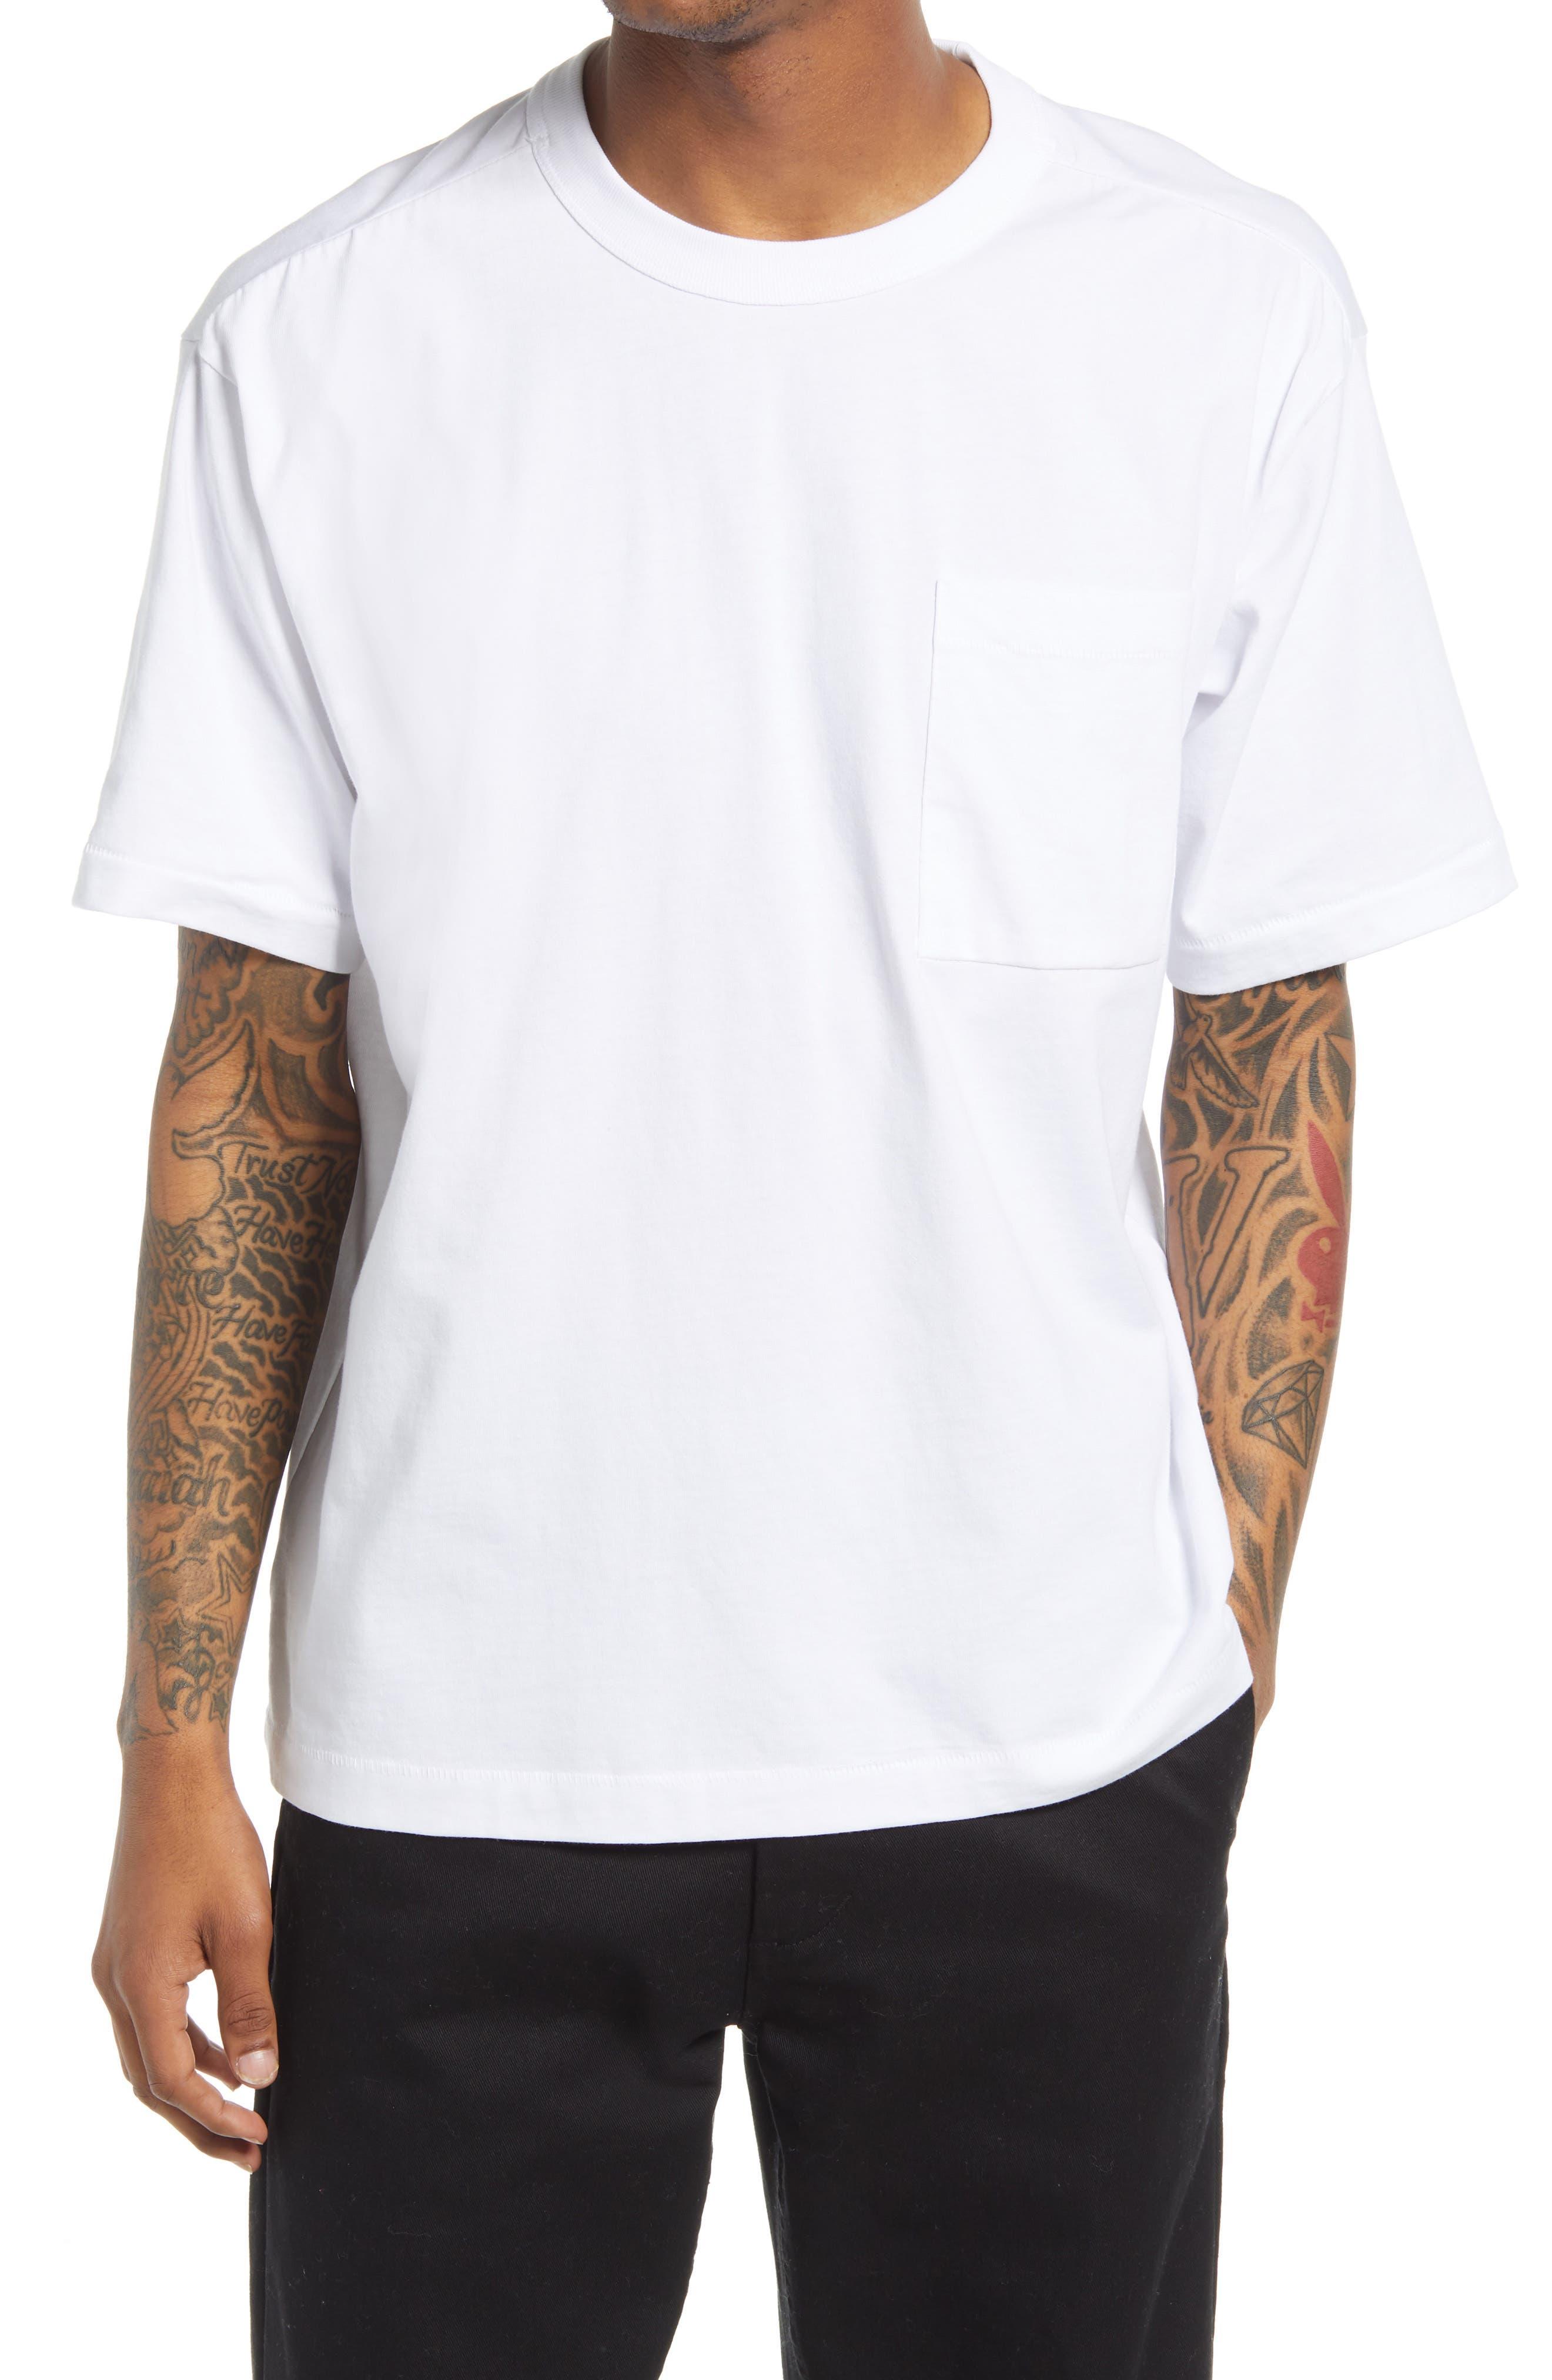 Unisex Cotton Pocket T-Shirt